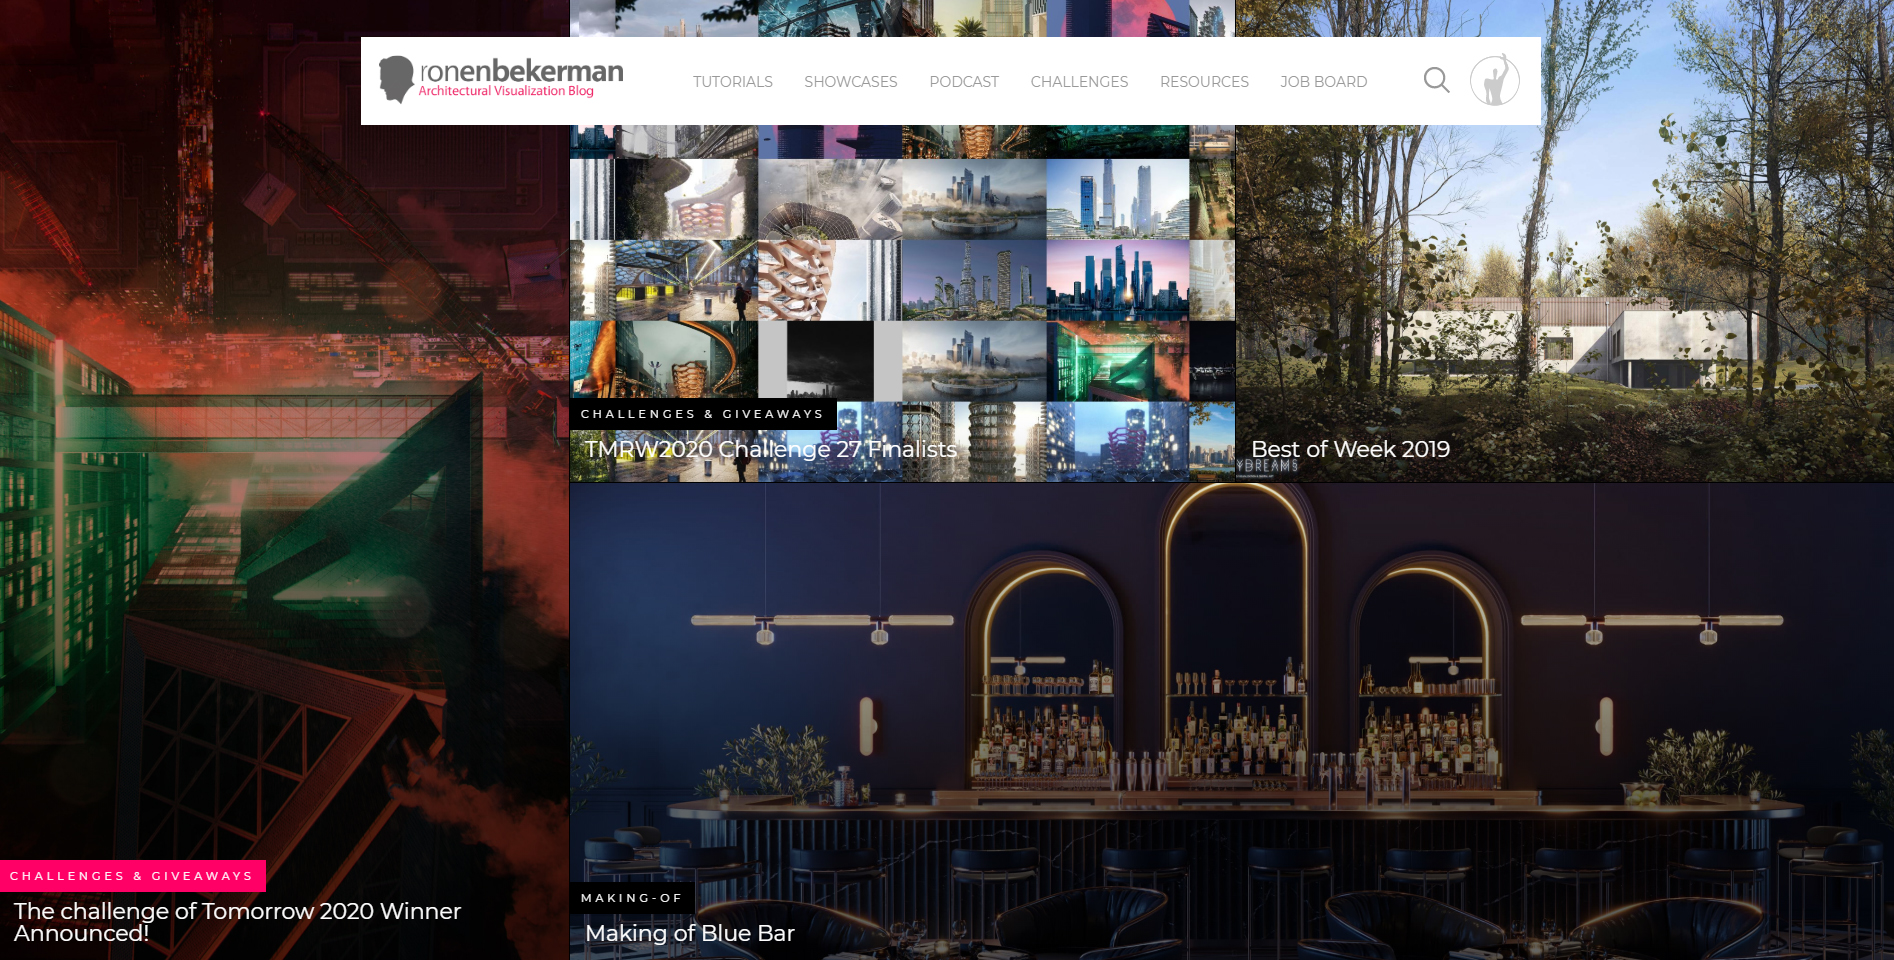 Finding Inspiration on Ronenbekerman Website